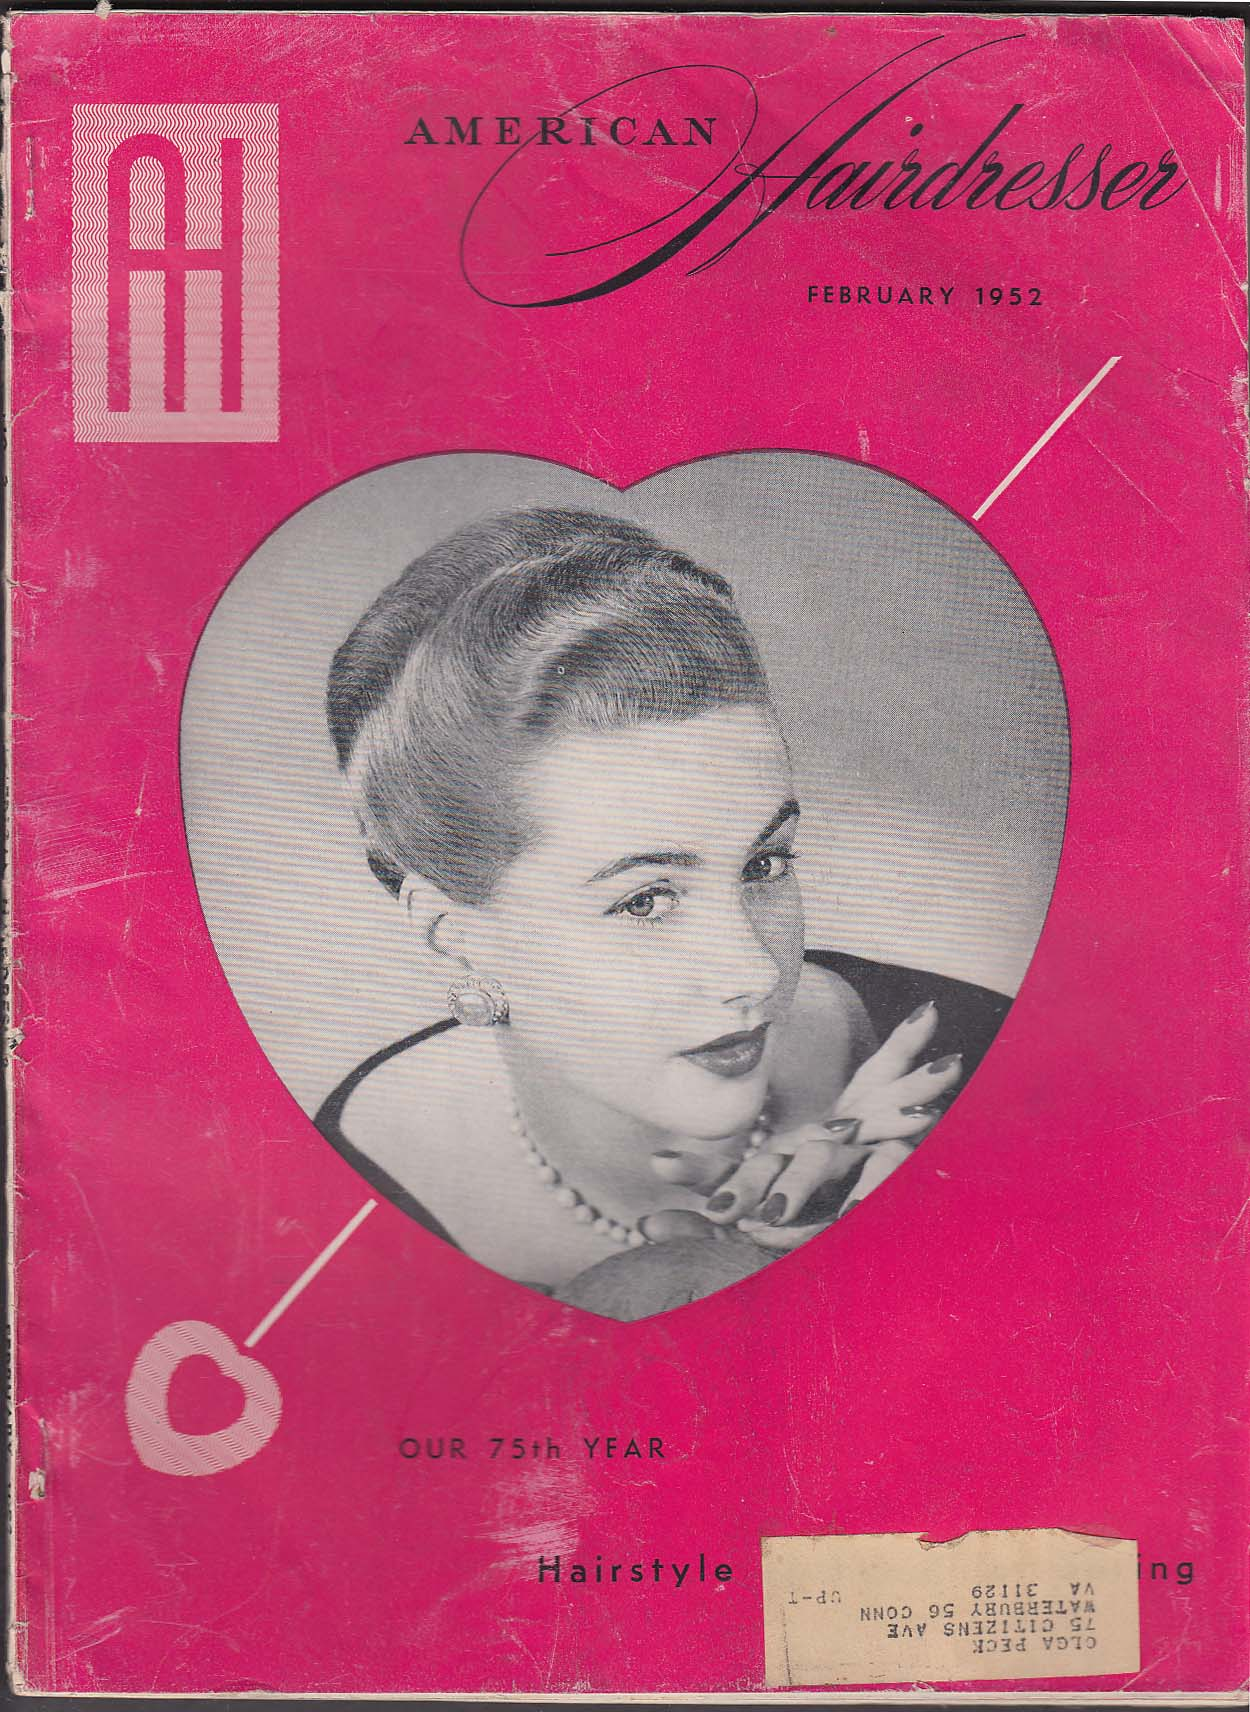 AMERICAN HAIRDRESSER Philip Prafeta Anthony Colletti ++ 2 1952